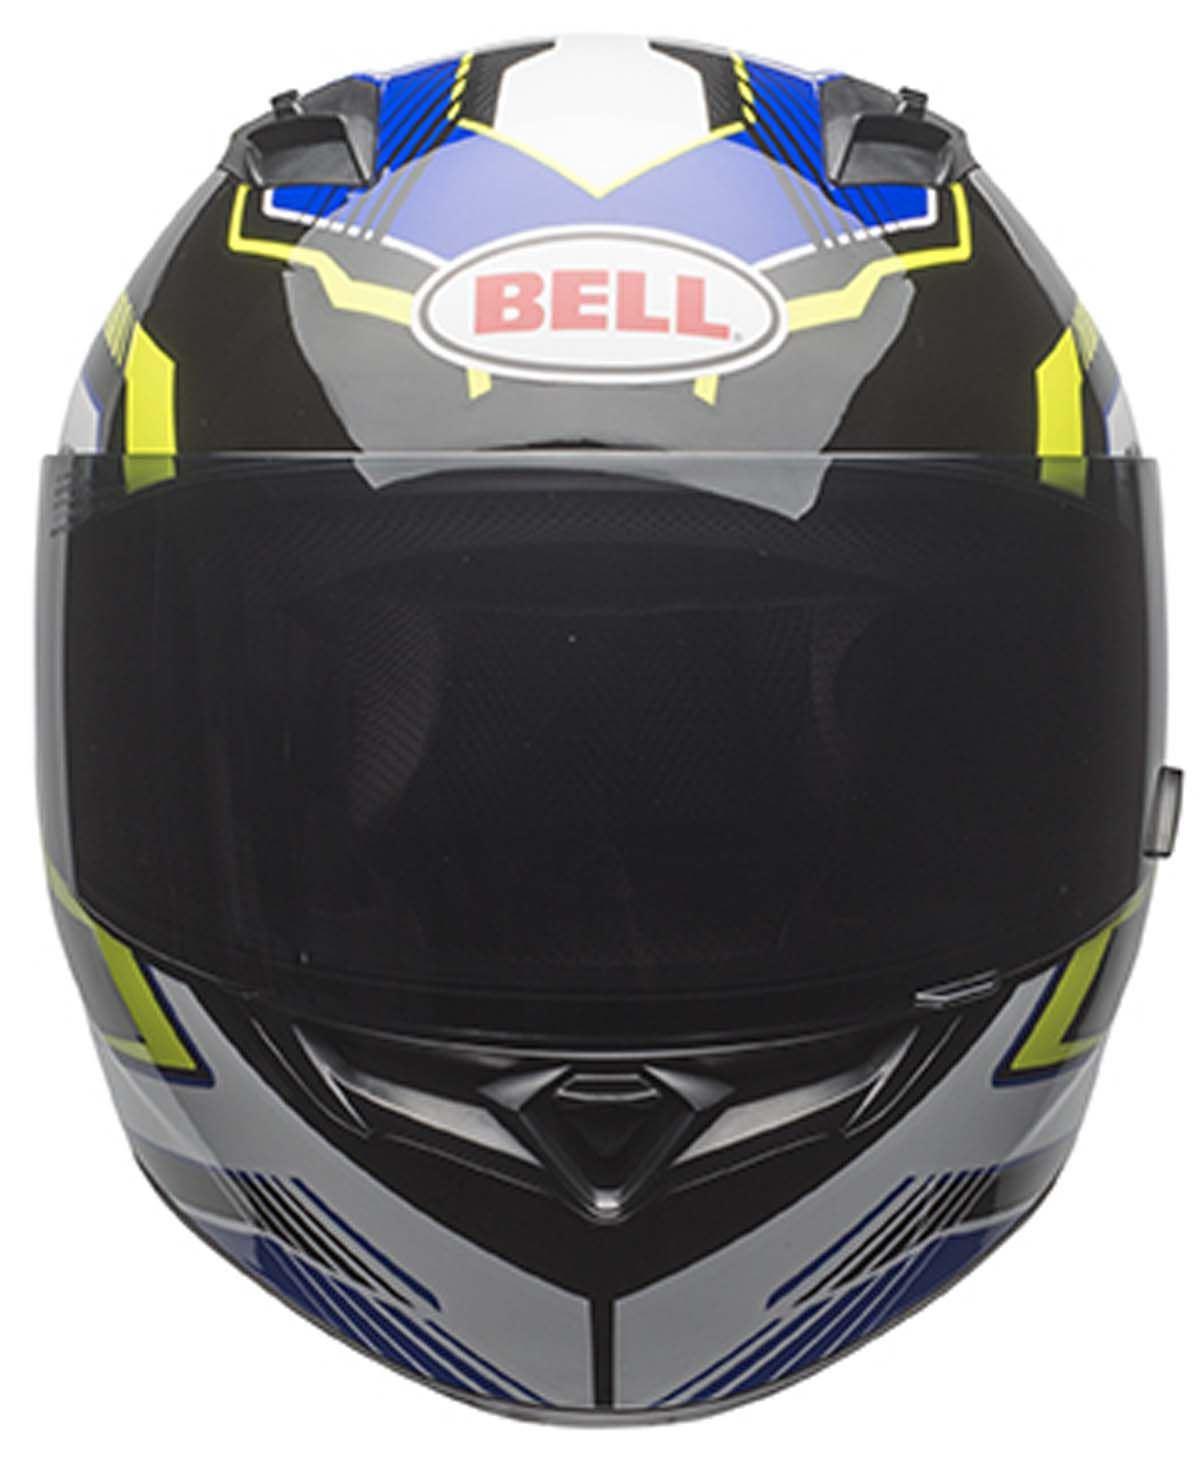 Bell-Qualifier-Helmet-Full-Face-Motorcycle-Clear-Shield-DOT-XS-3XL miniature 25